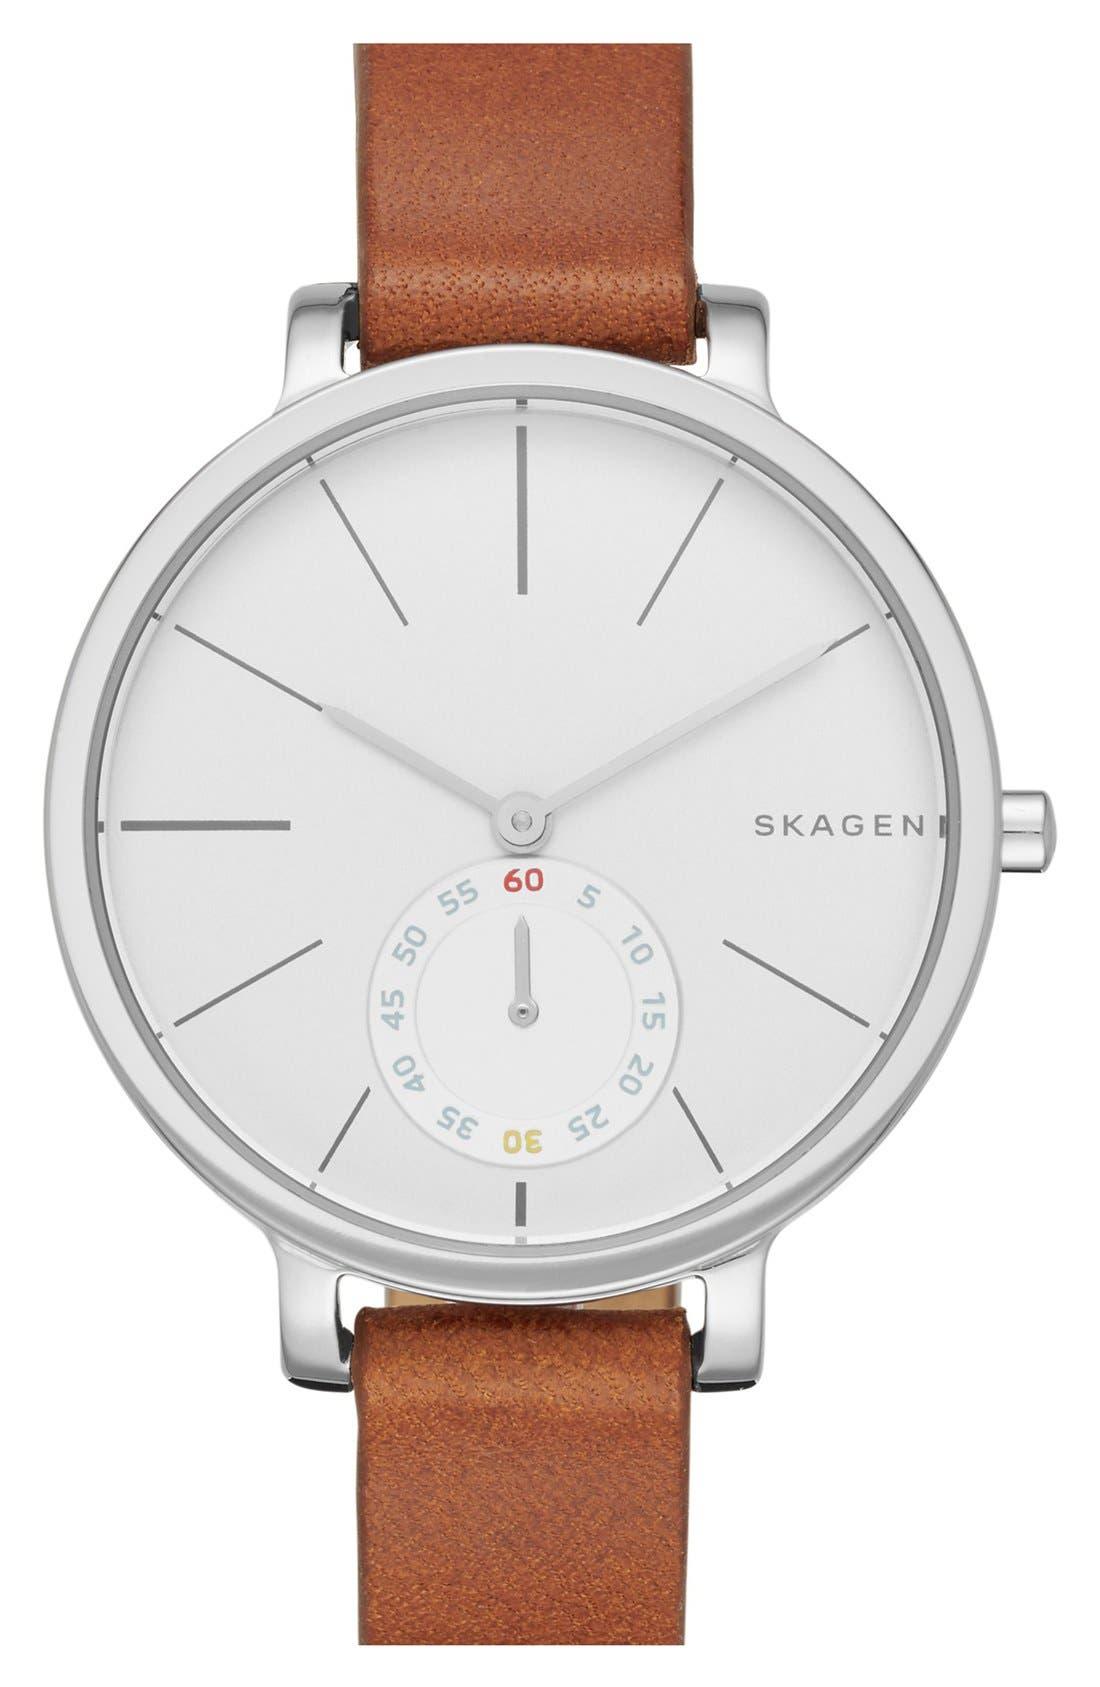 Main Image - Skagen 'Hagen' Leather Strap Watch, 34mm